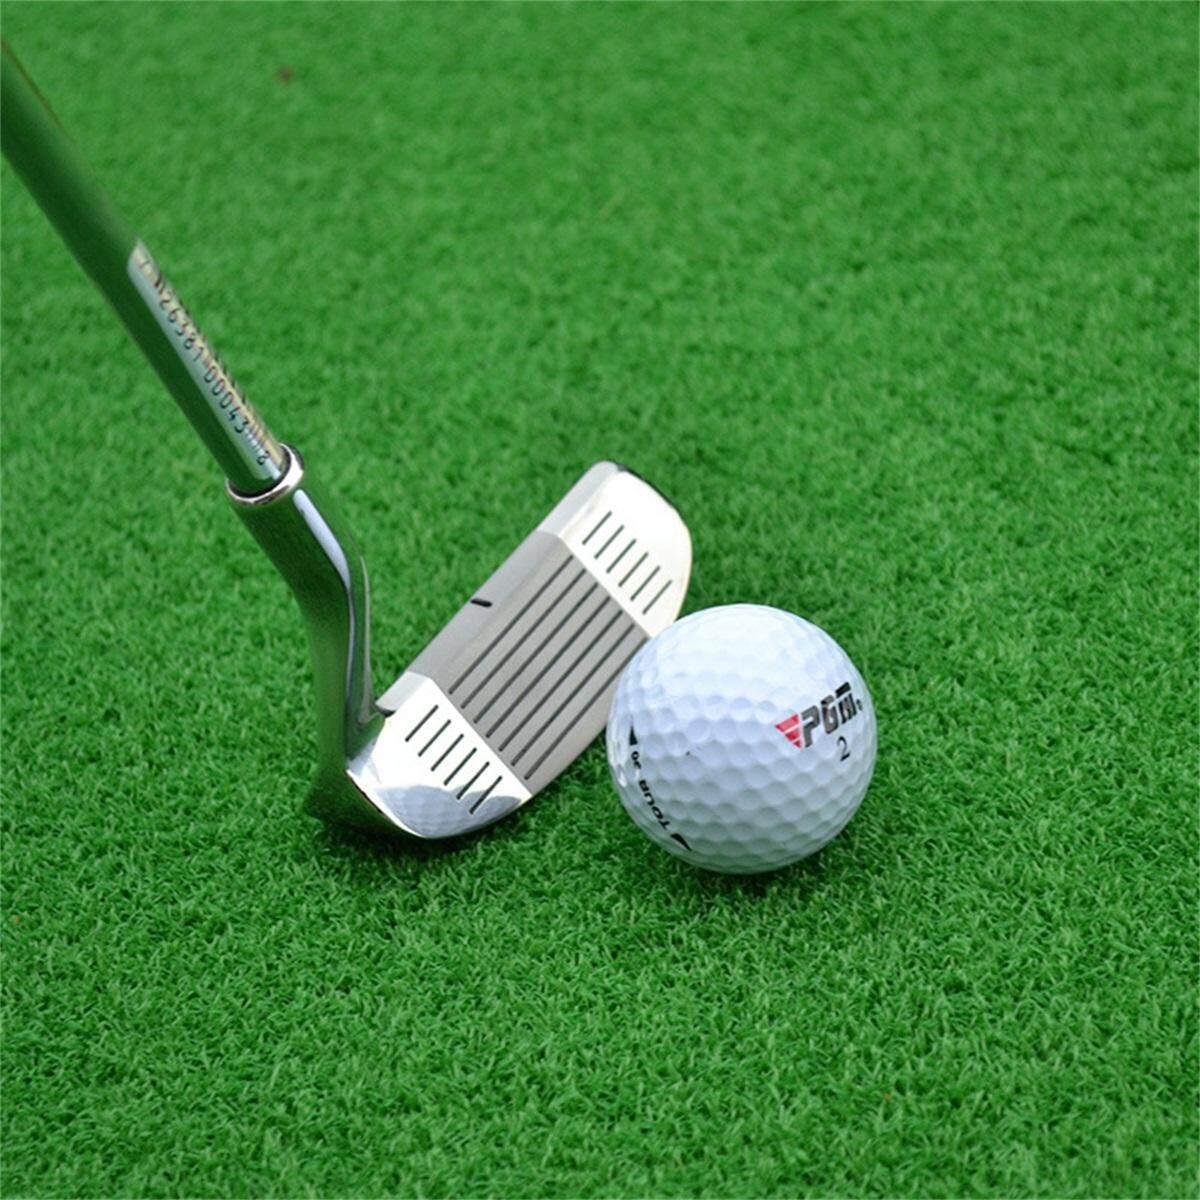 Pgm Golf Double-Side Chipper Kepala Baja Antikarat Chipping Klub Sport By Fuloophi.